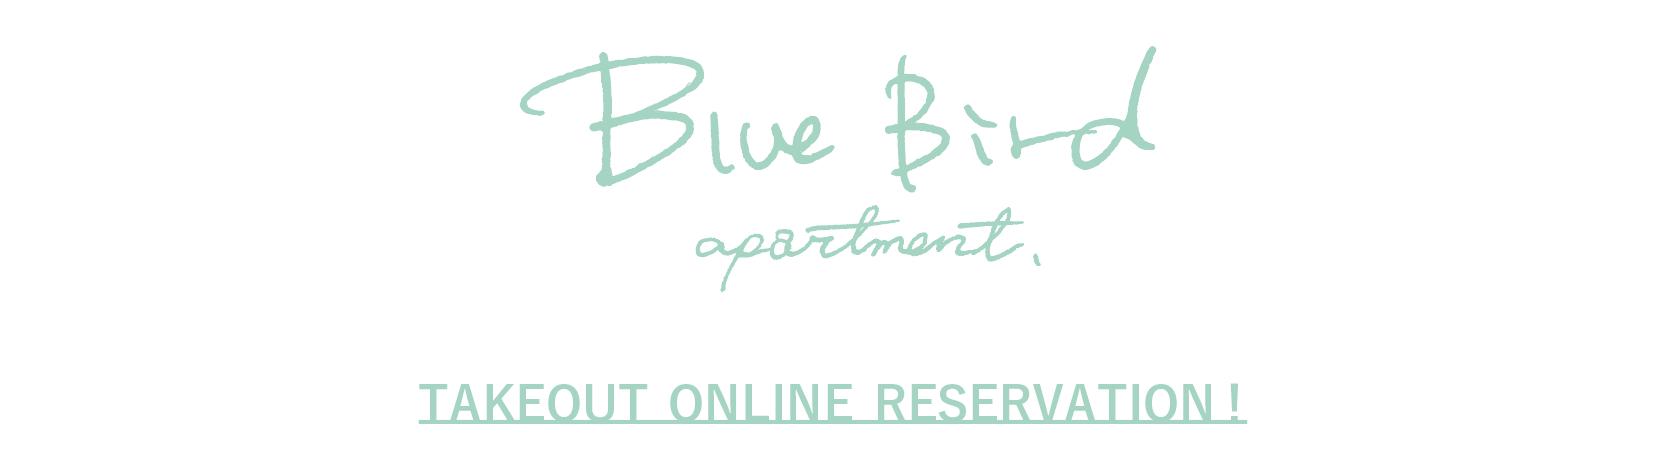 Blue Bird apartment. |TAKEOUT MENU ONLINE!